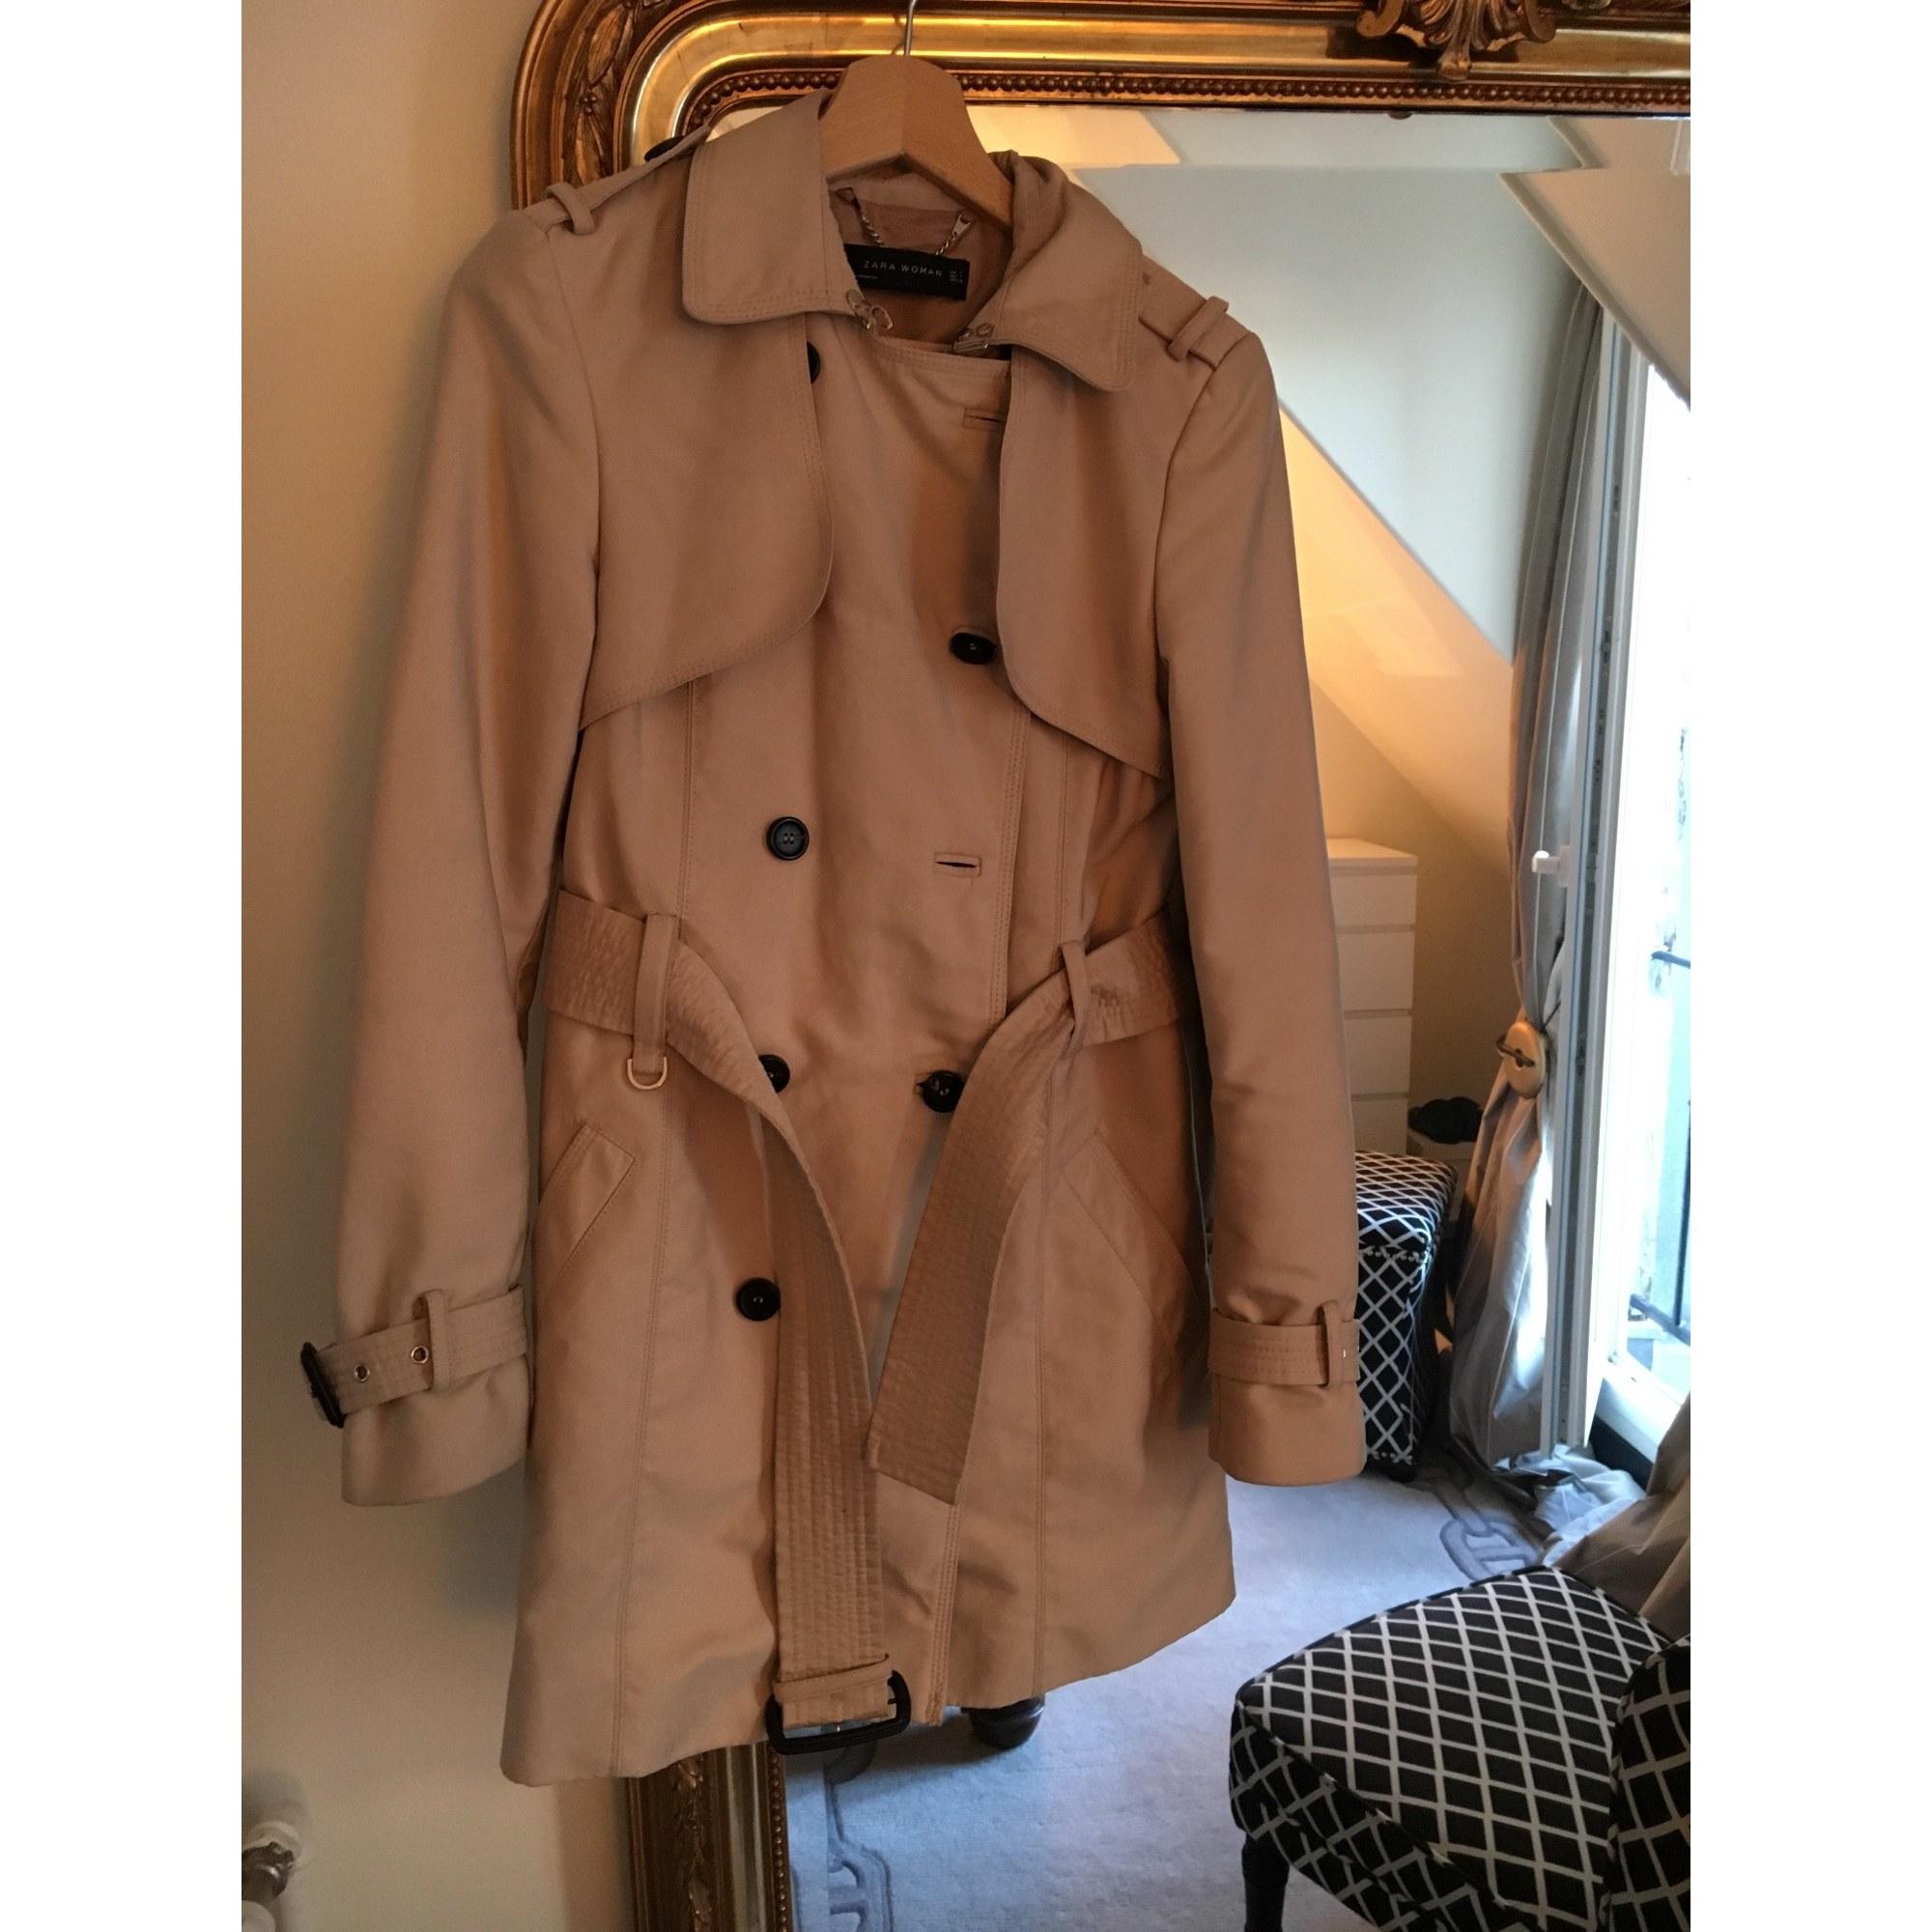 Imperméable 36 beige trench dressing ZARA vendu My T1 par S love Errqwp